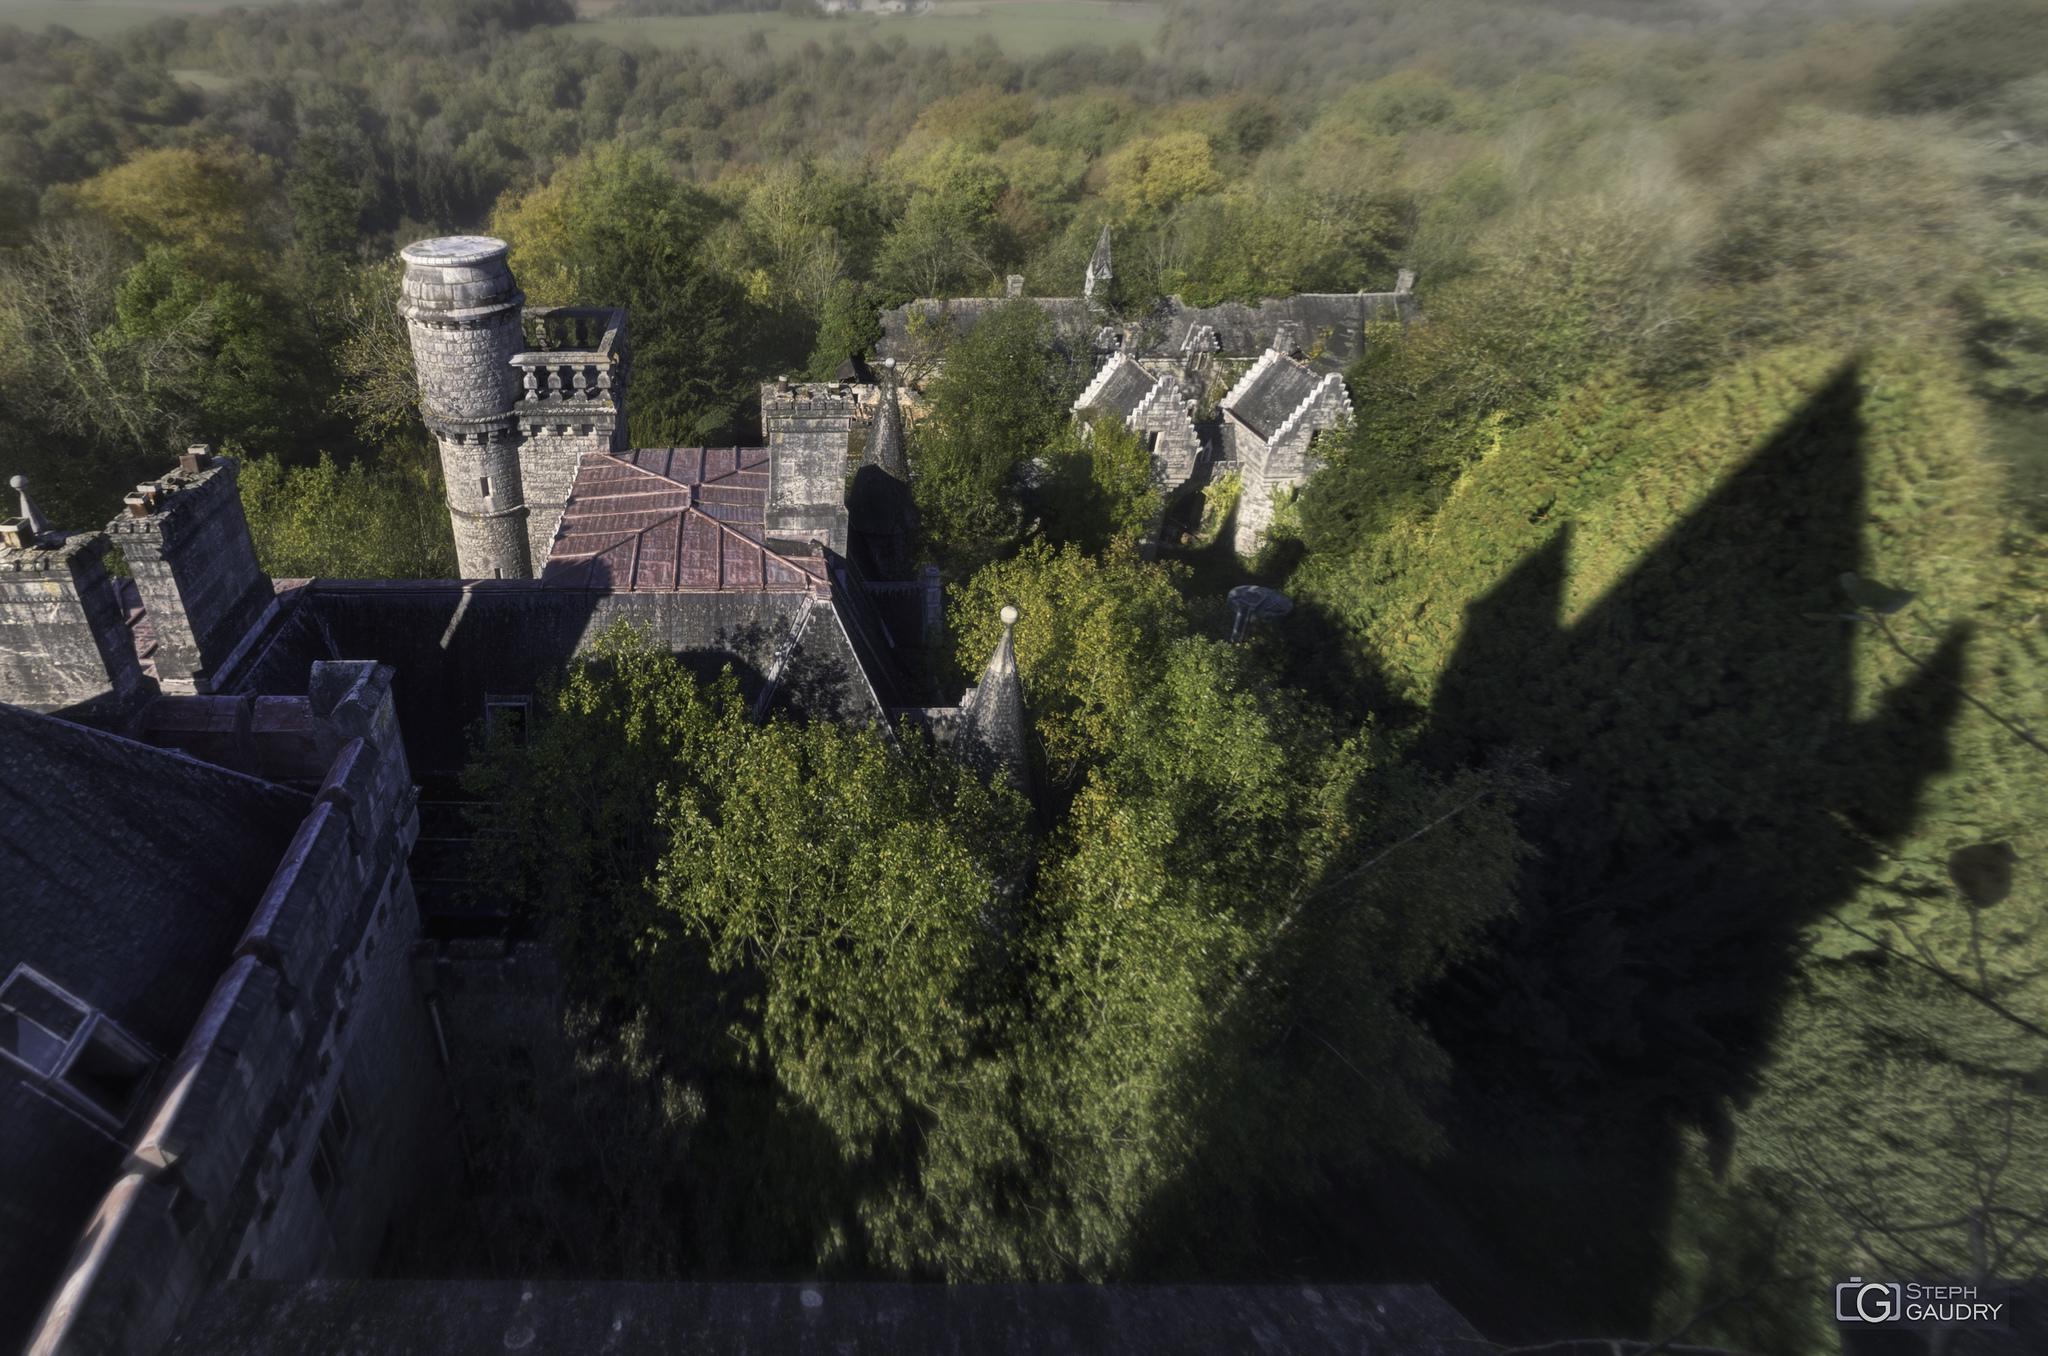 Dans l'ombre de la tour [Klik om de diavoorstelling te starten]